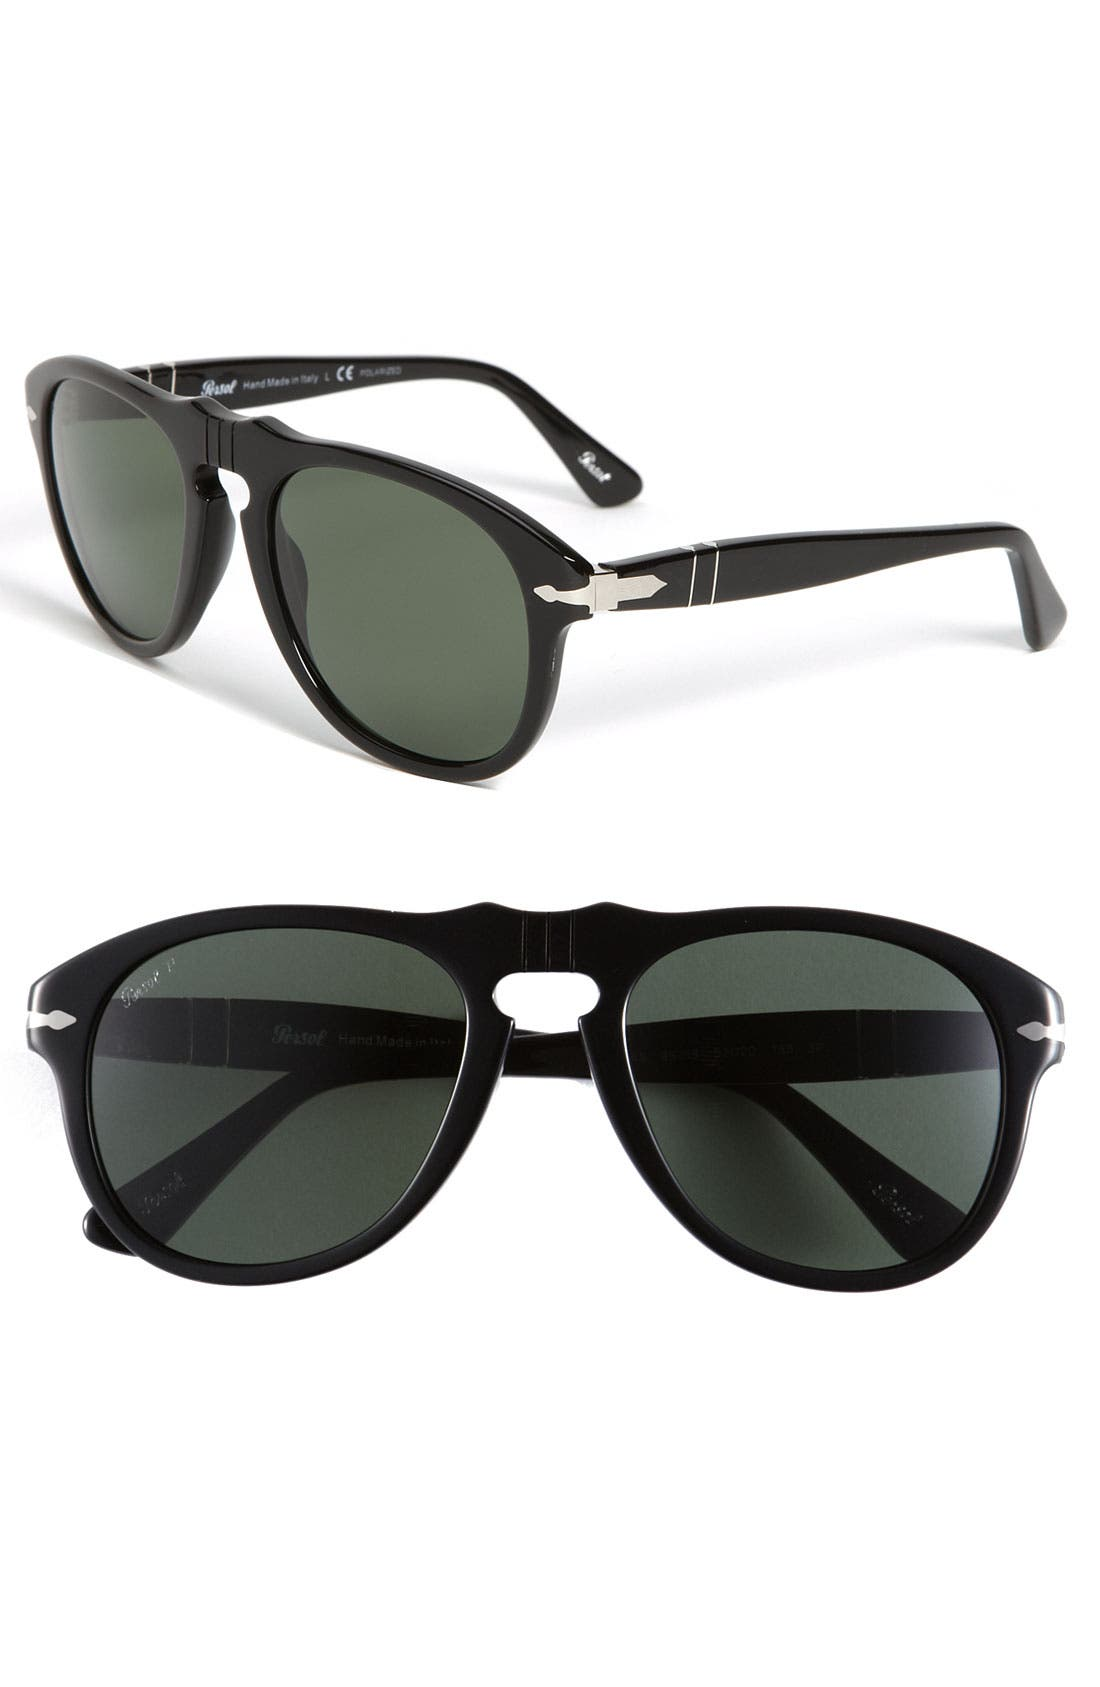 Alternate Image 1 Selected - Persol 54mm Polarized Keyhole Retro Sunglasses